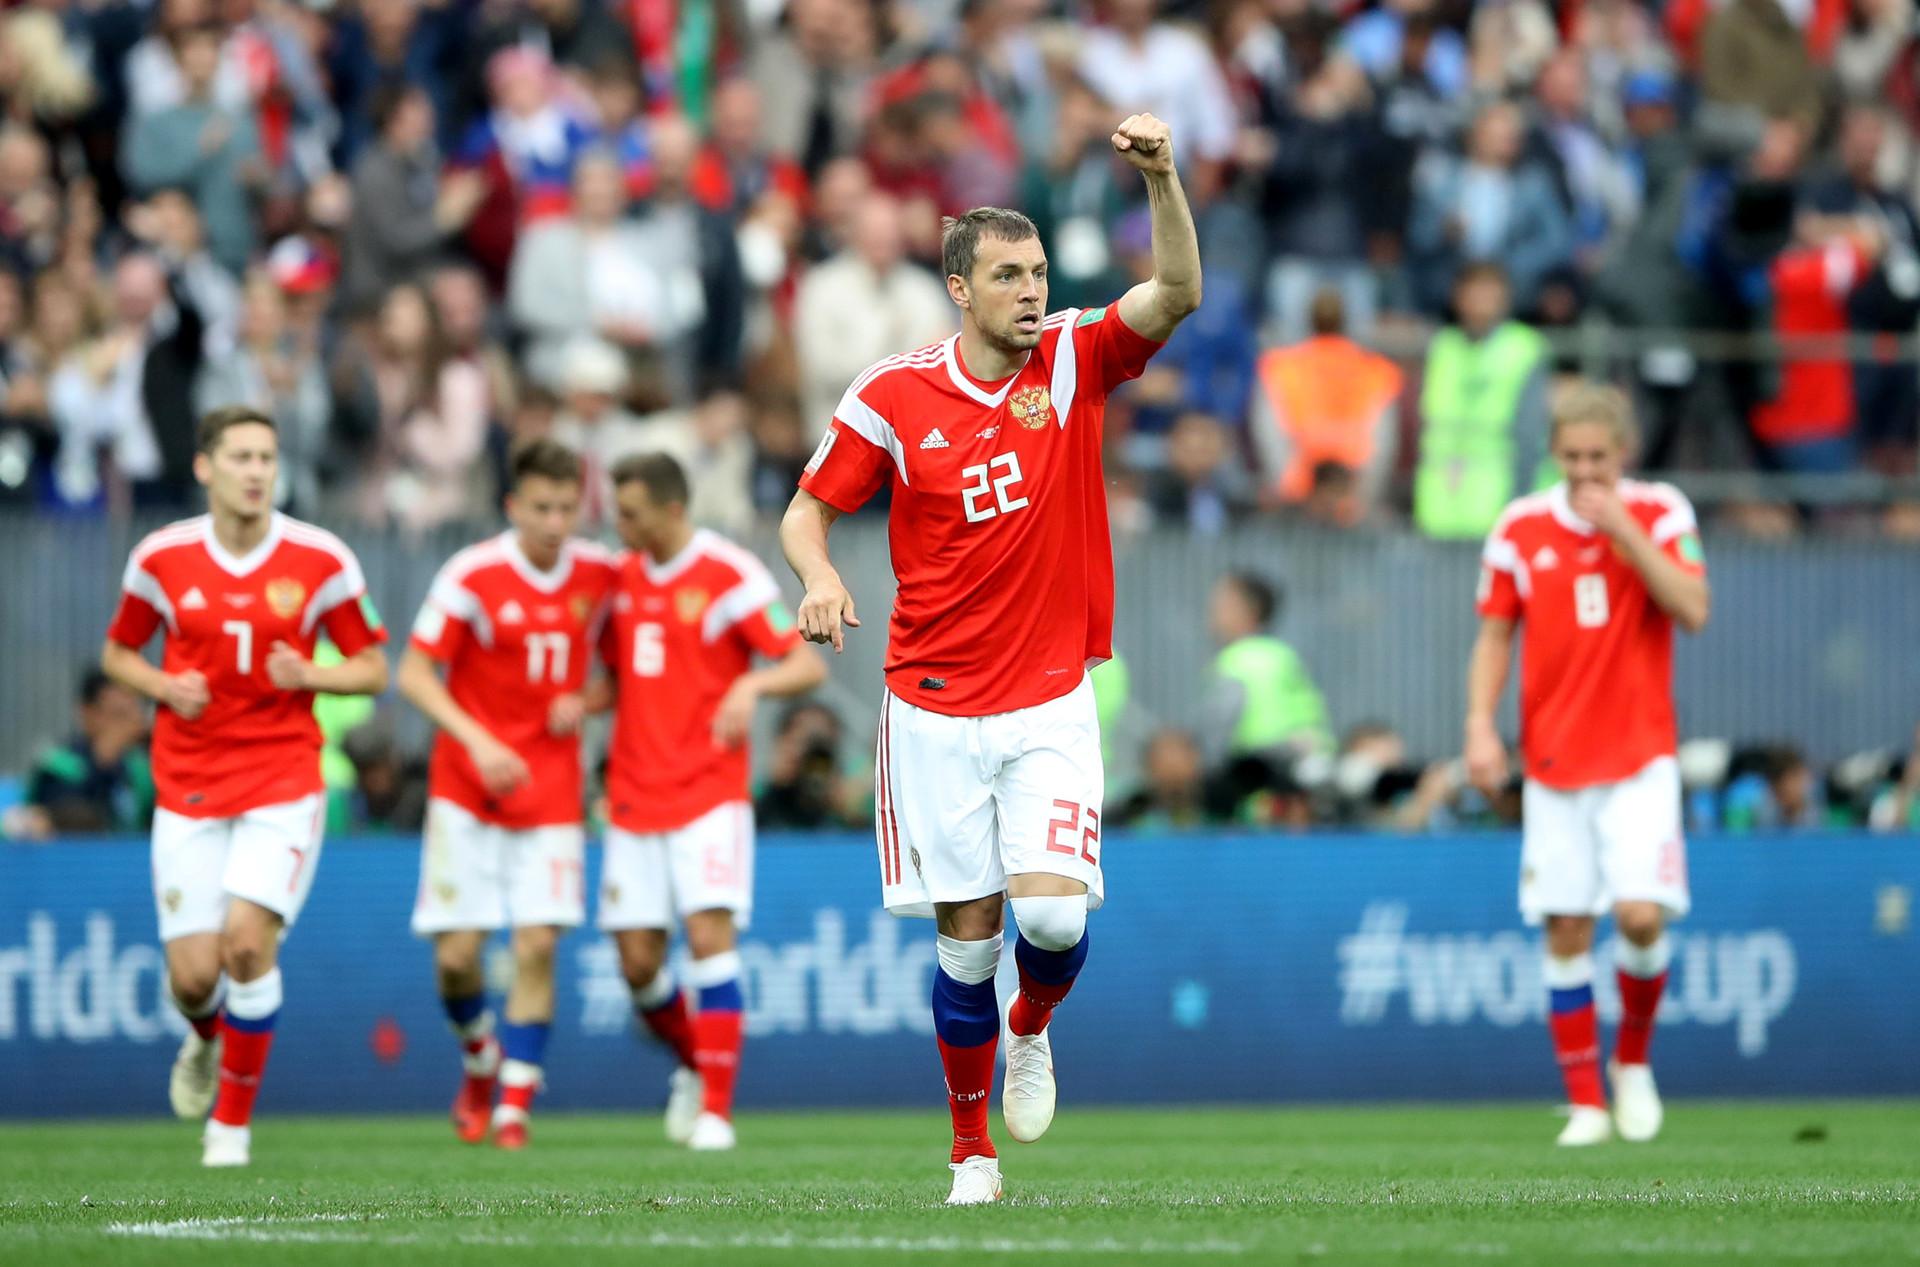 world_cup_russia_2018_fifa_14.06.2018_futbol_footbal_